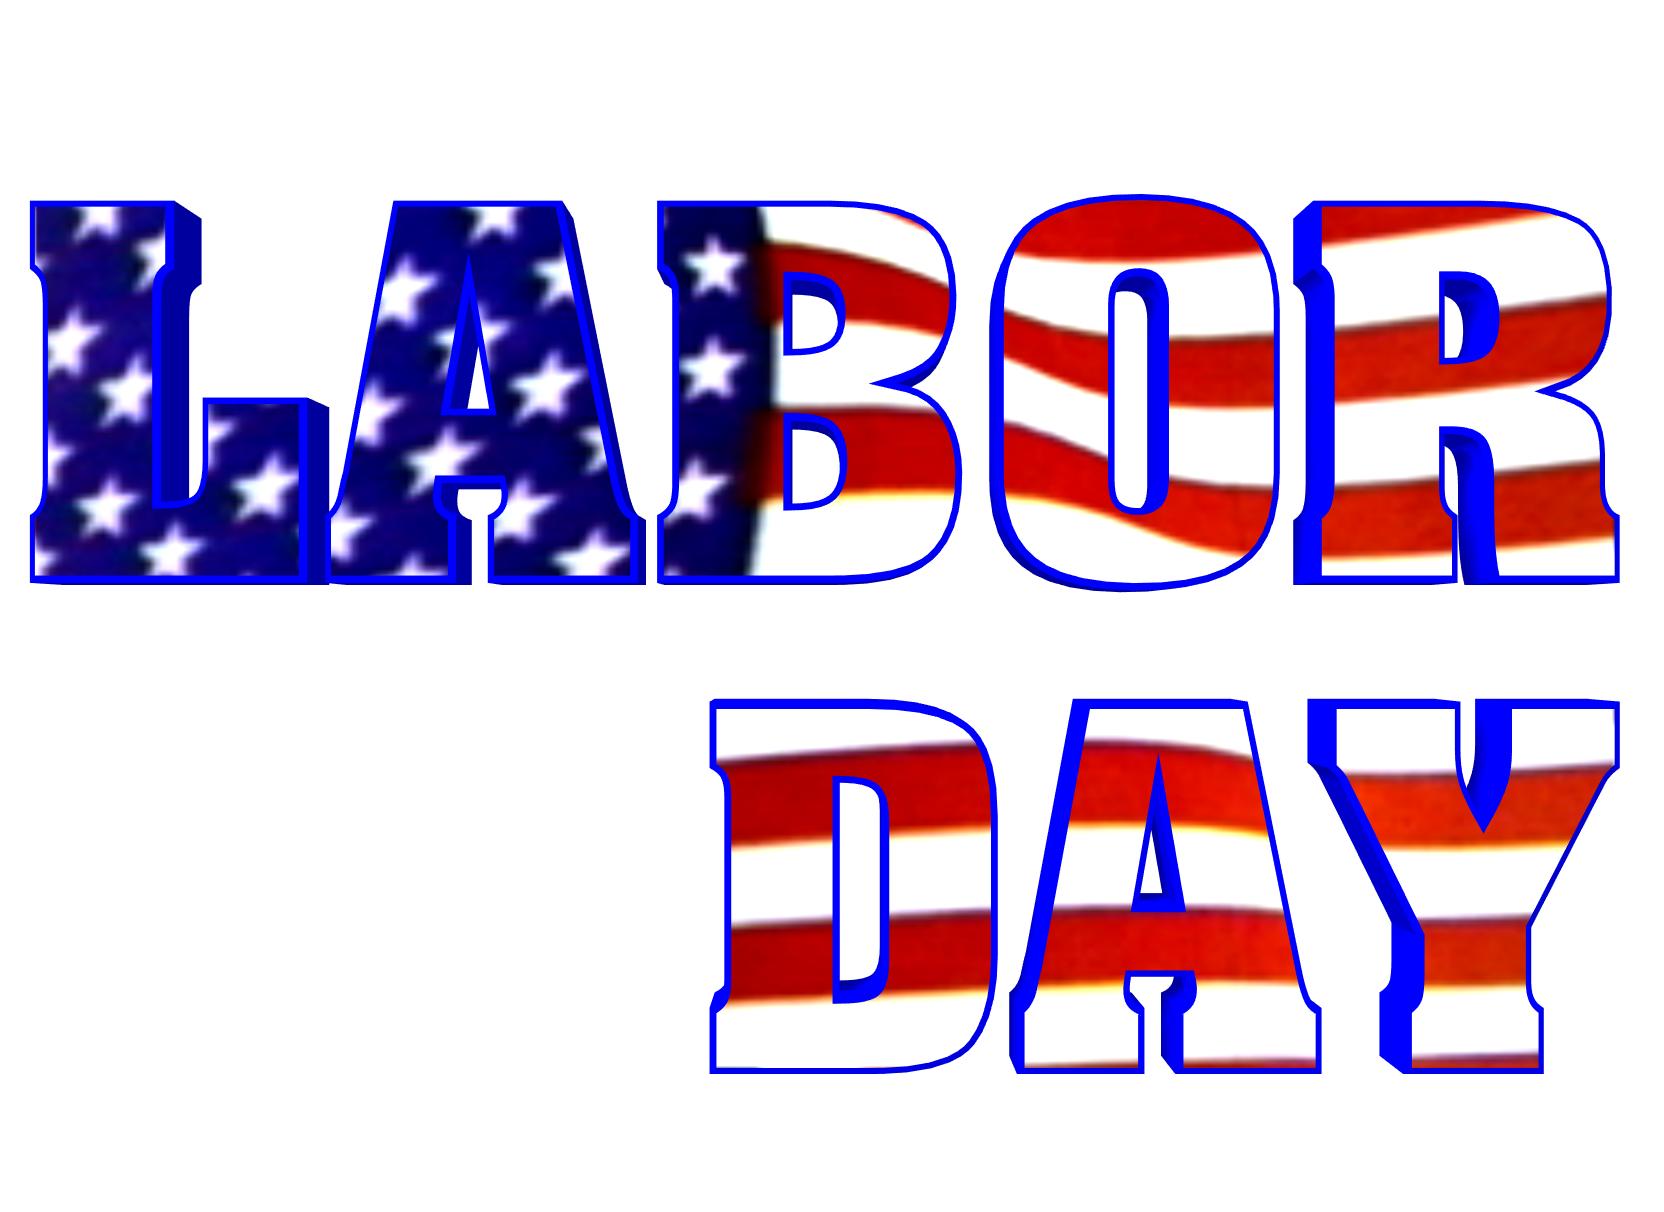 Word labor clipart image freeuse stock Labor Day Pictures | Free download best Labor Day Pictures ... image freeuse stock